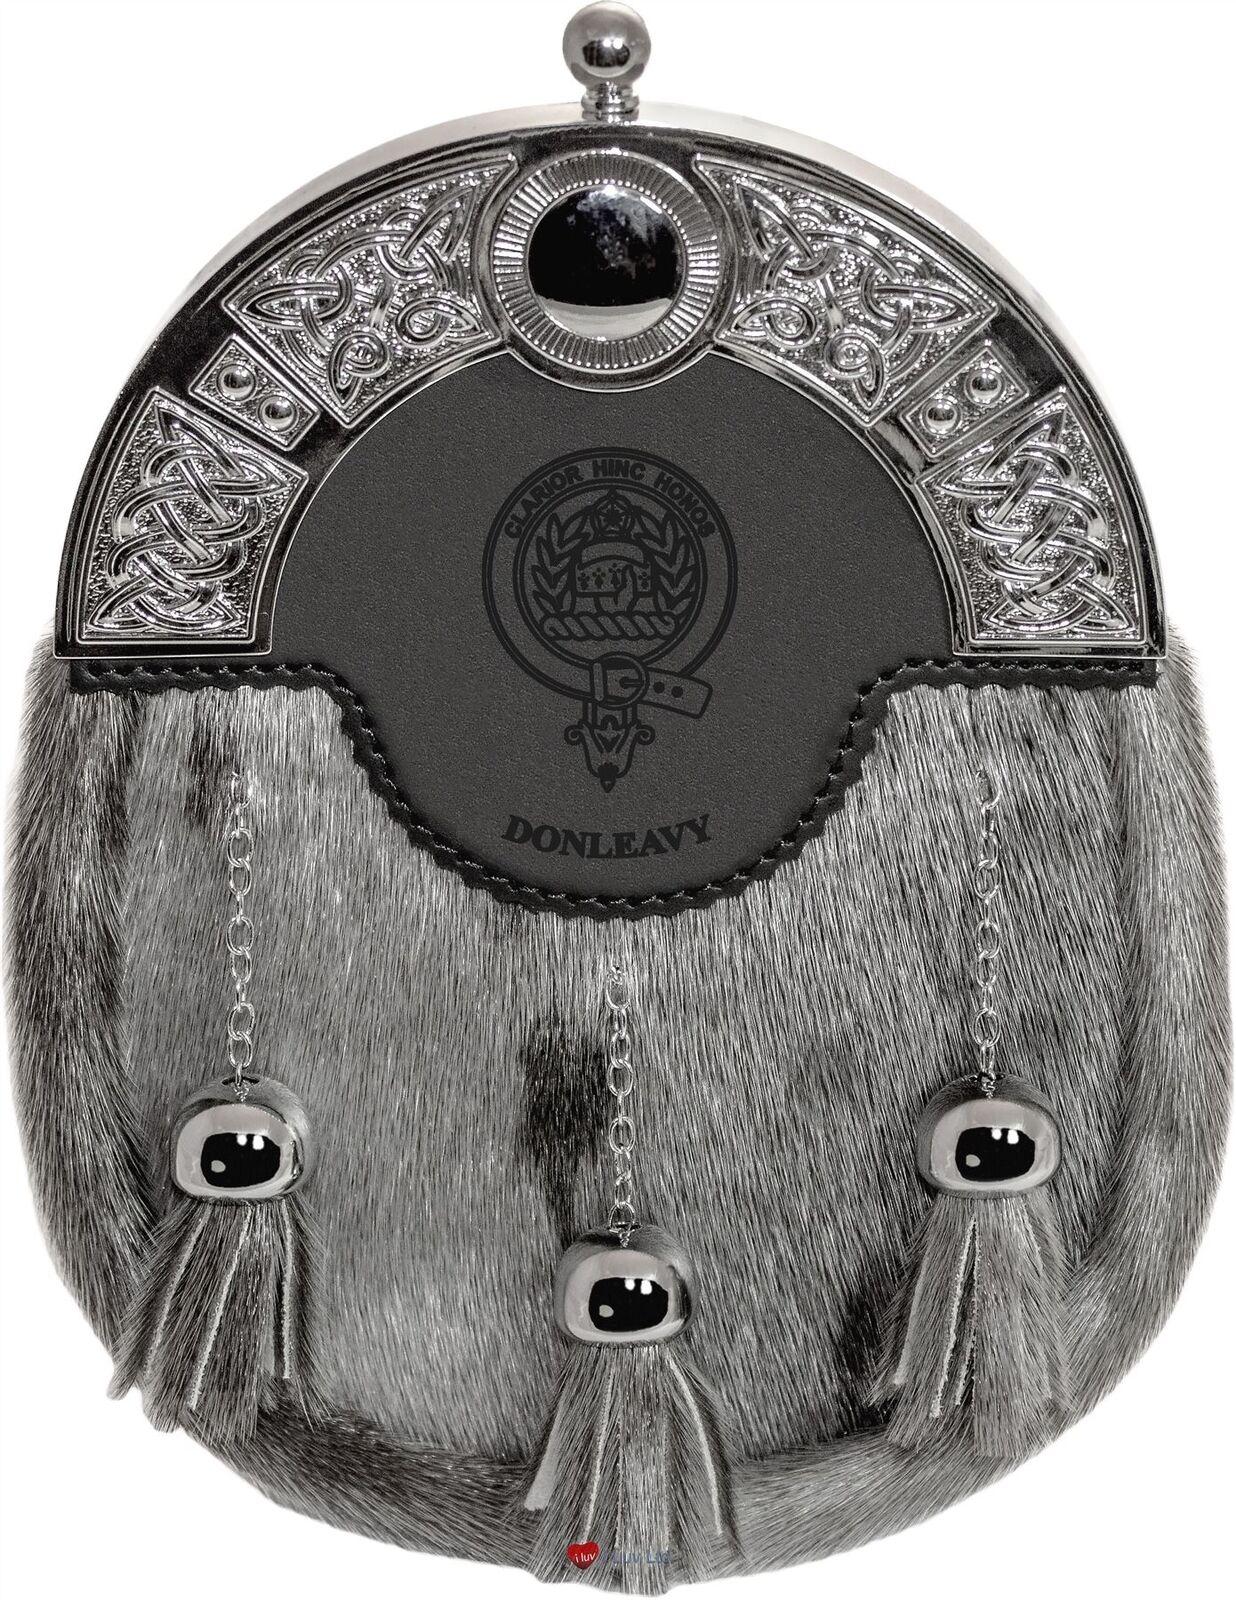 Donleavy Dress Sporran 3 Tassels Studded Celtic Arch Scottish Clan Crest